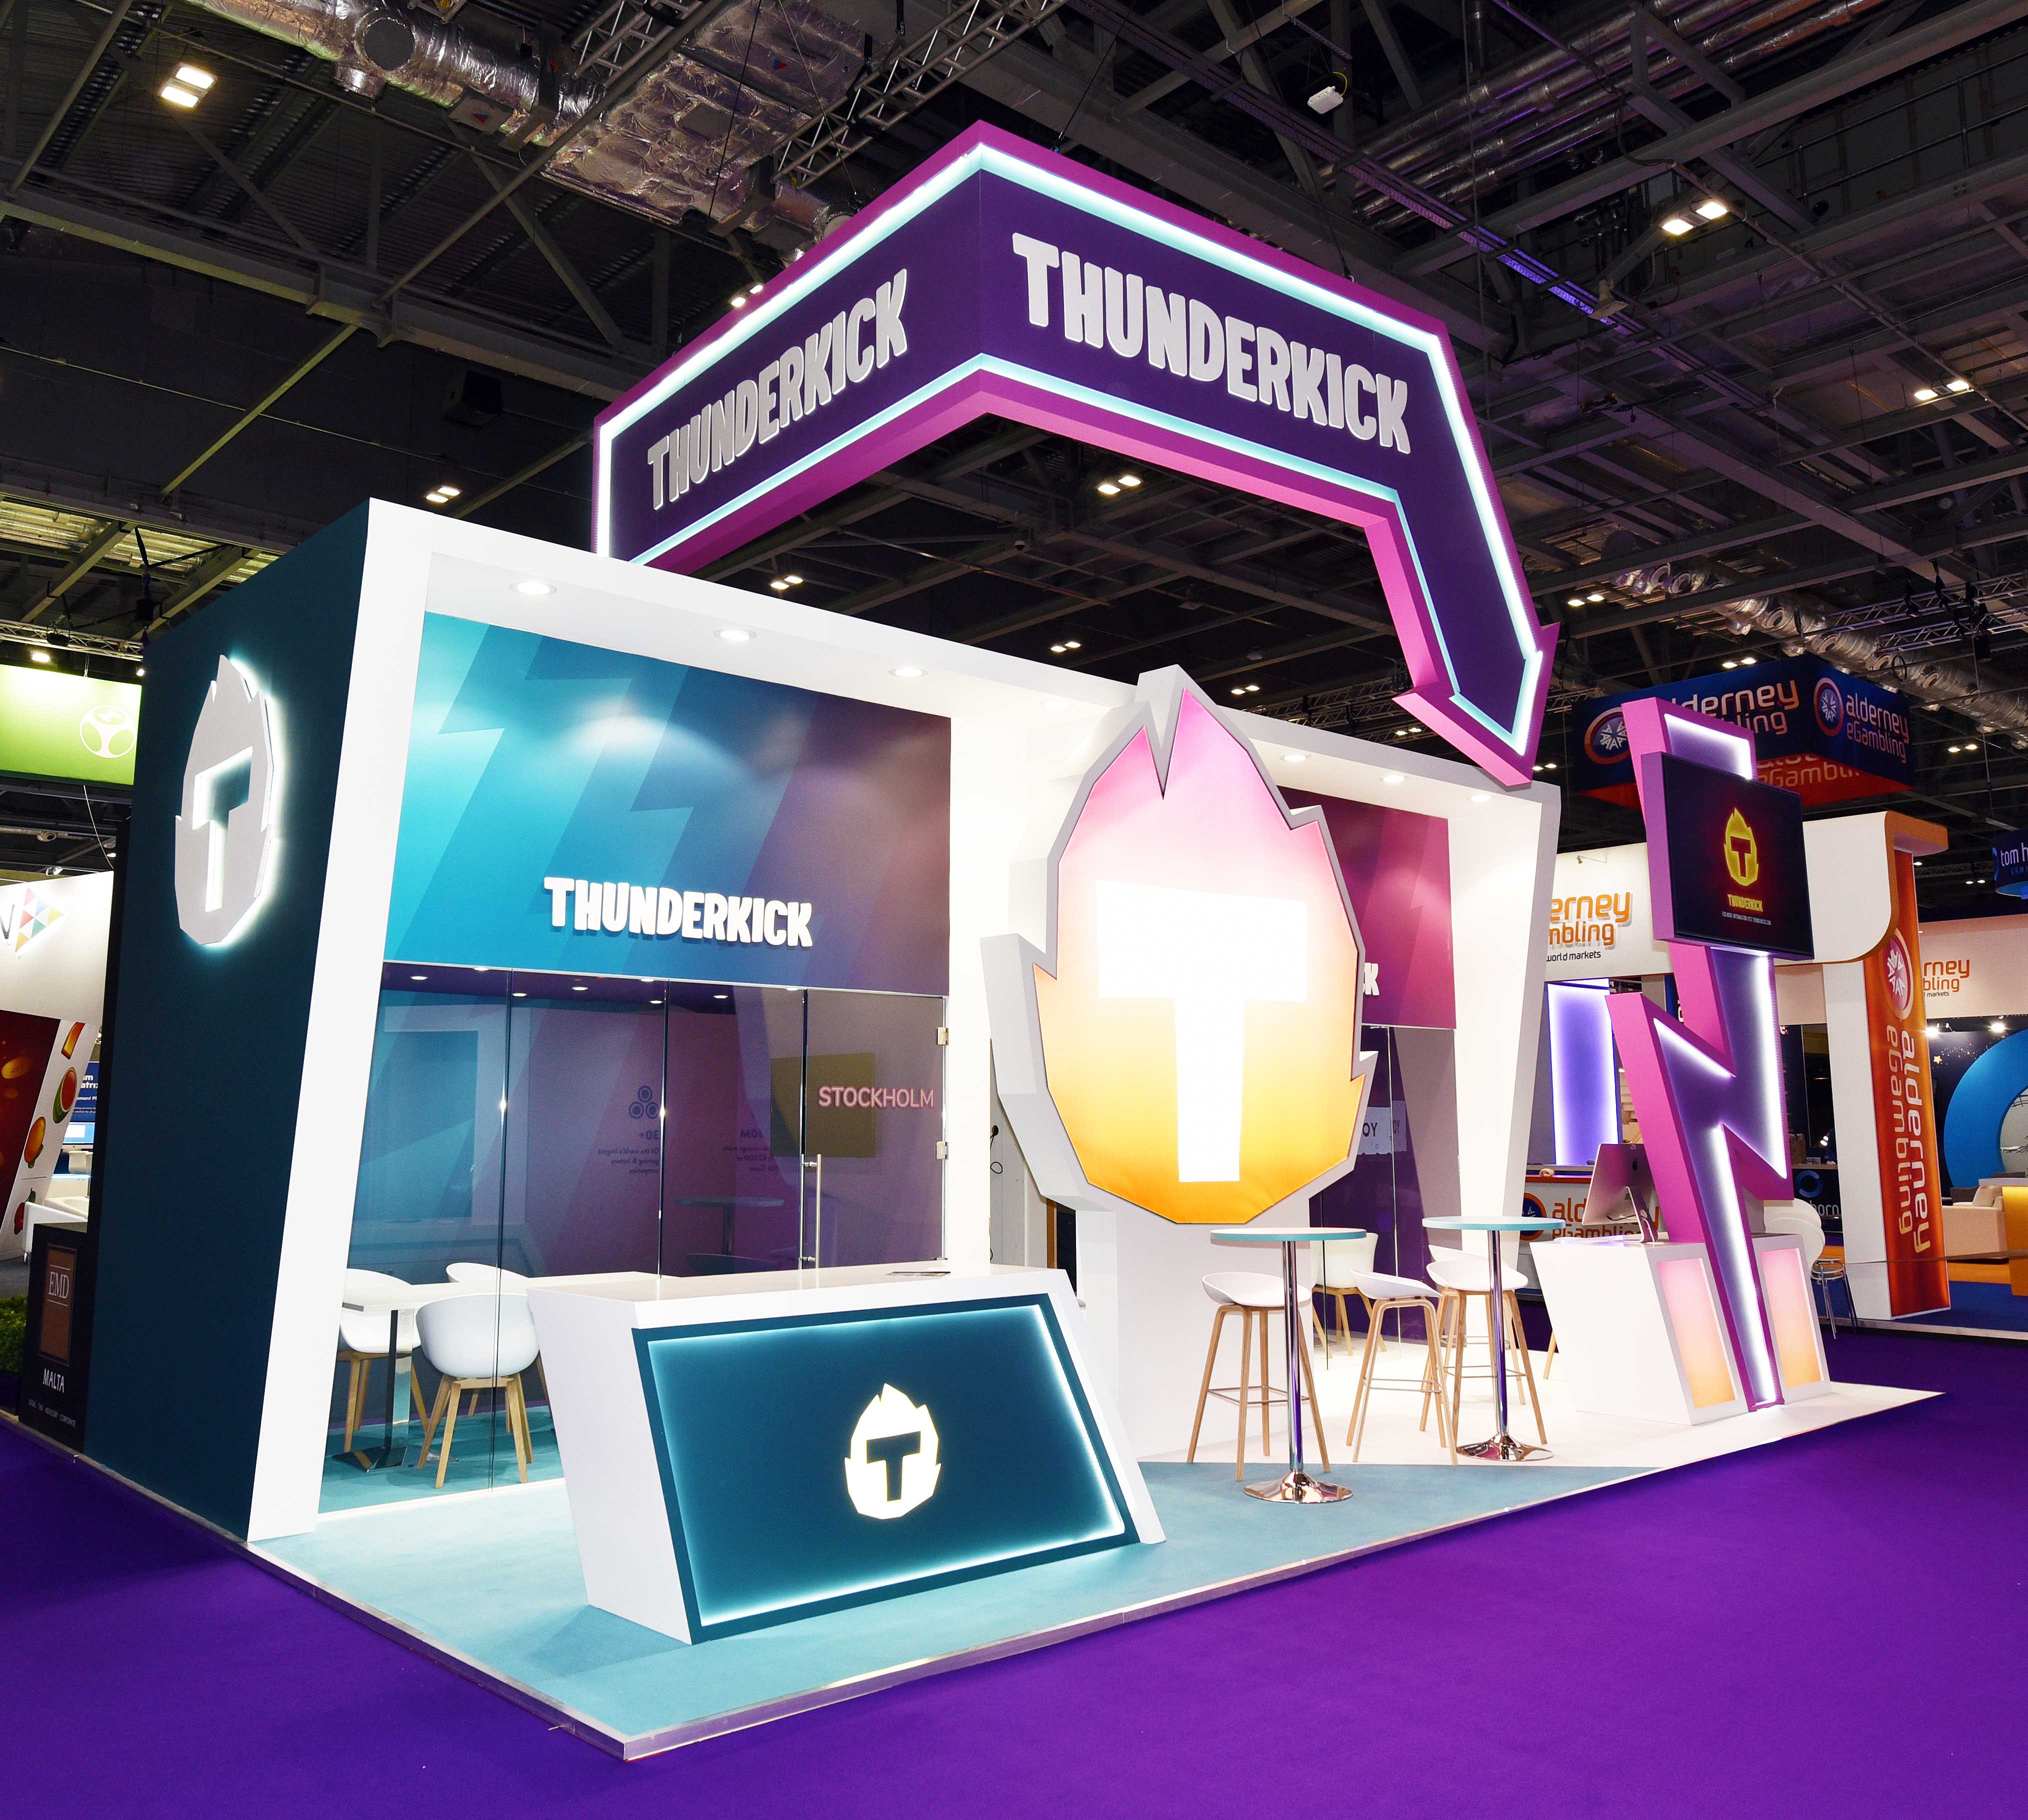 Exhibition stand designer and builder